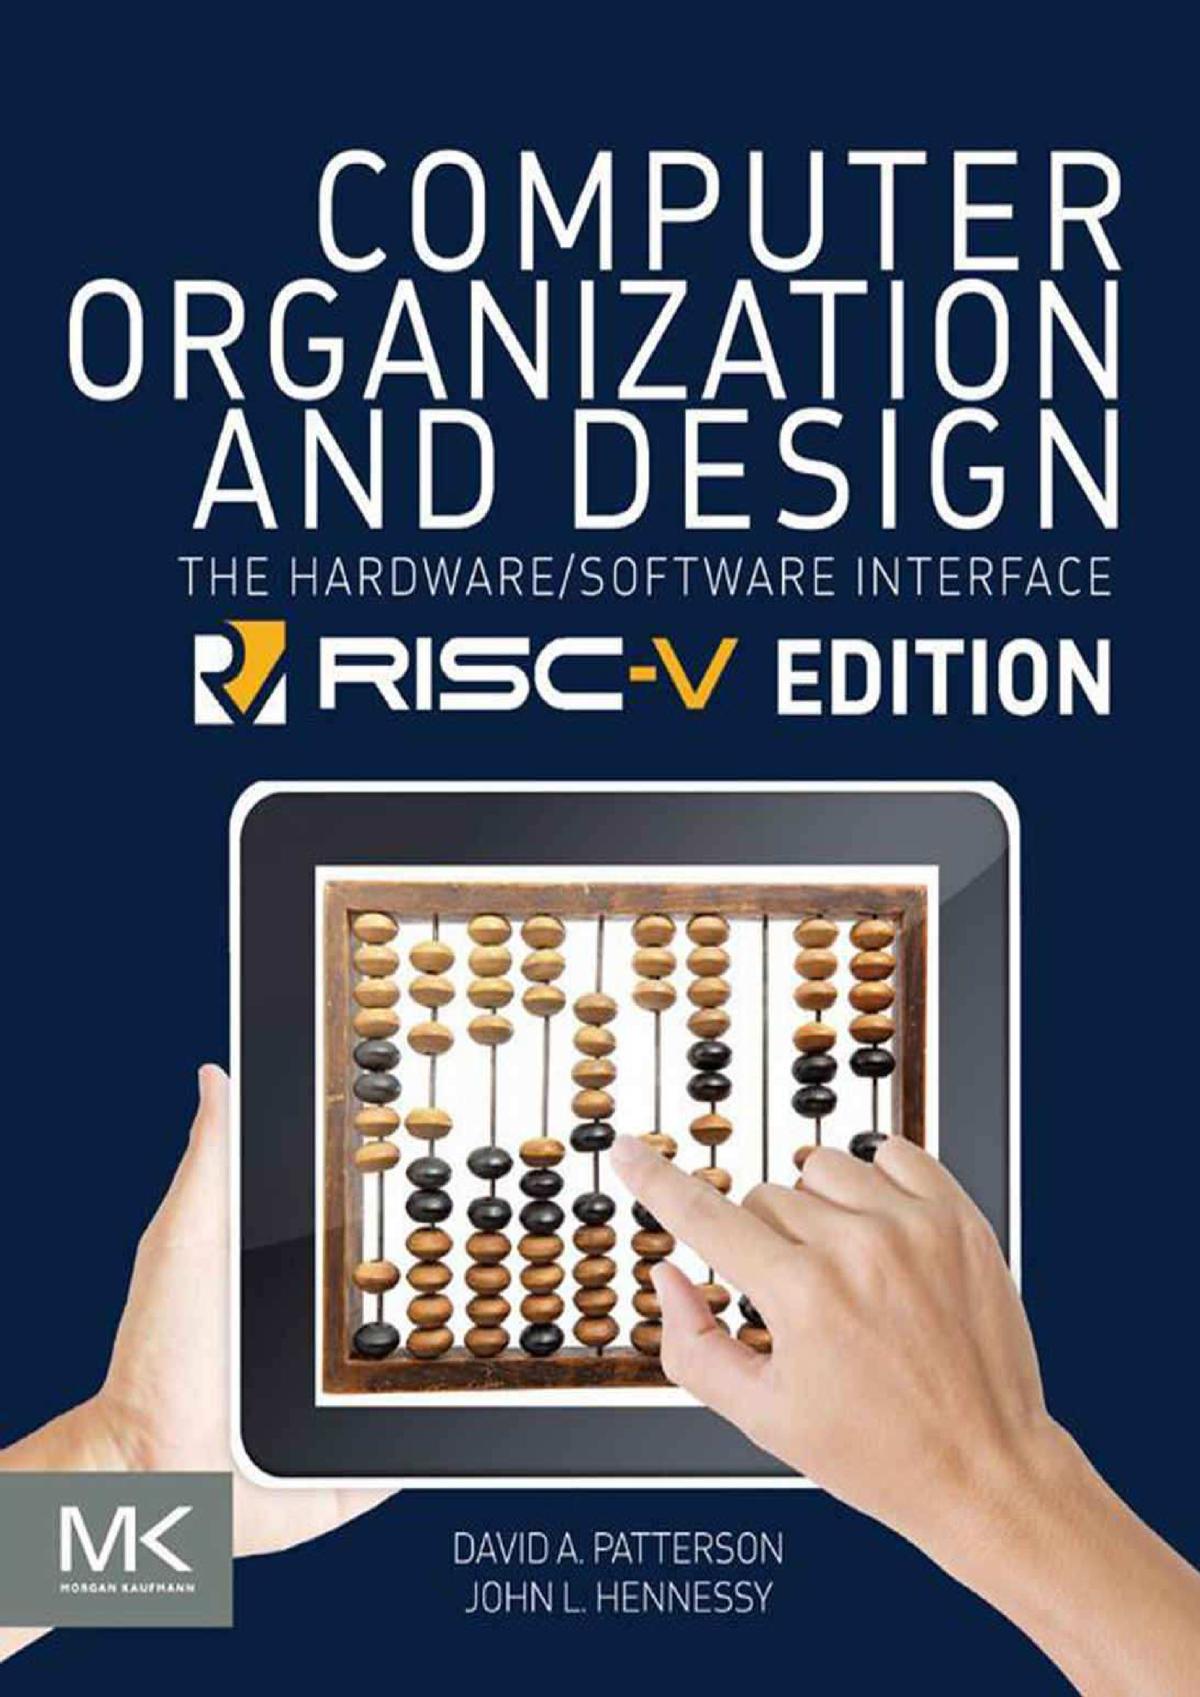 Computer Organization And Design Risc V Edition Infs 515 Studocu